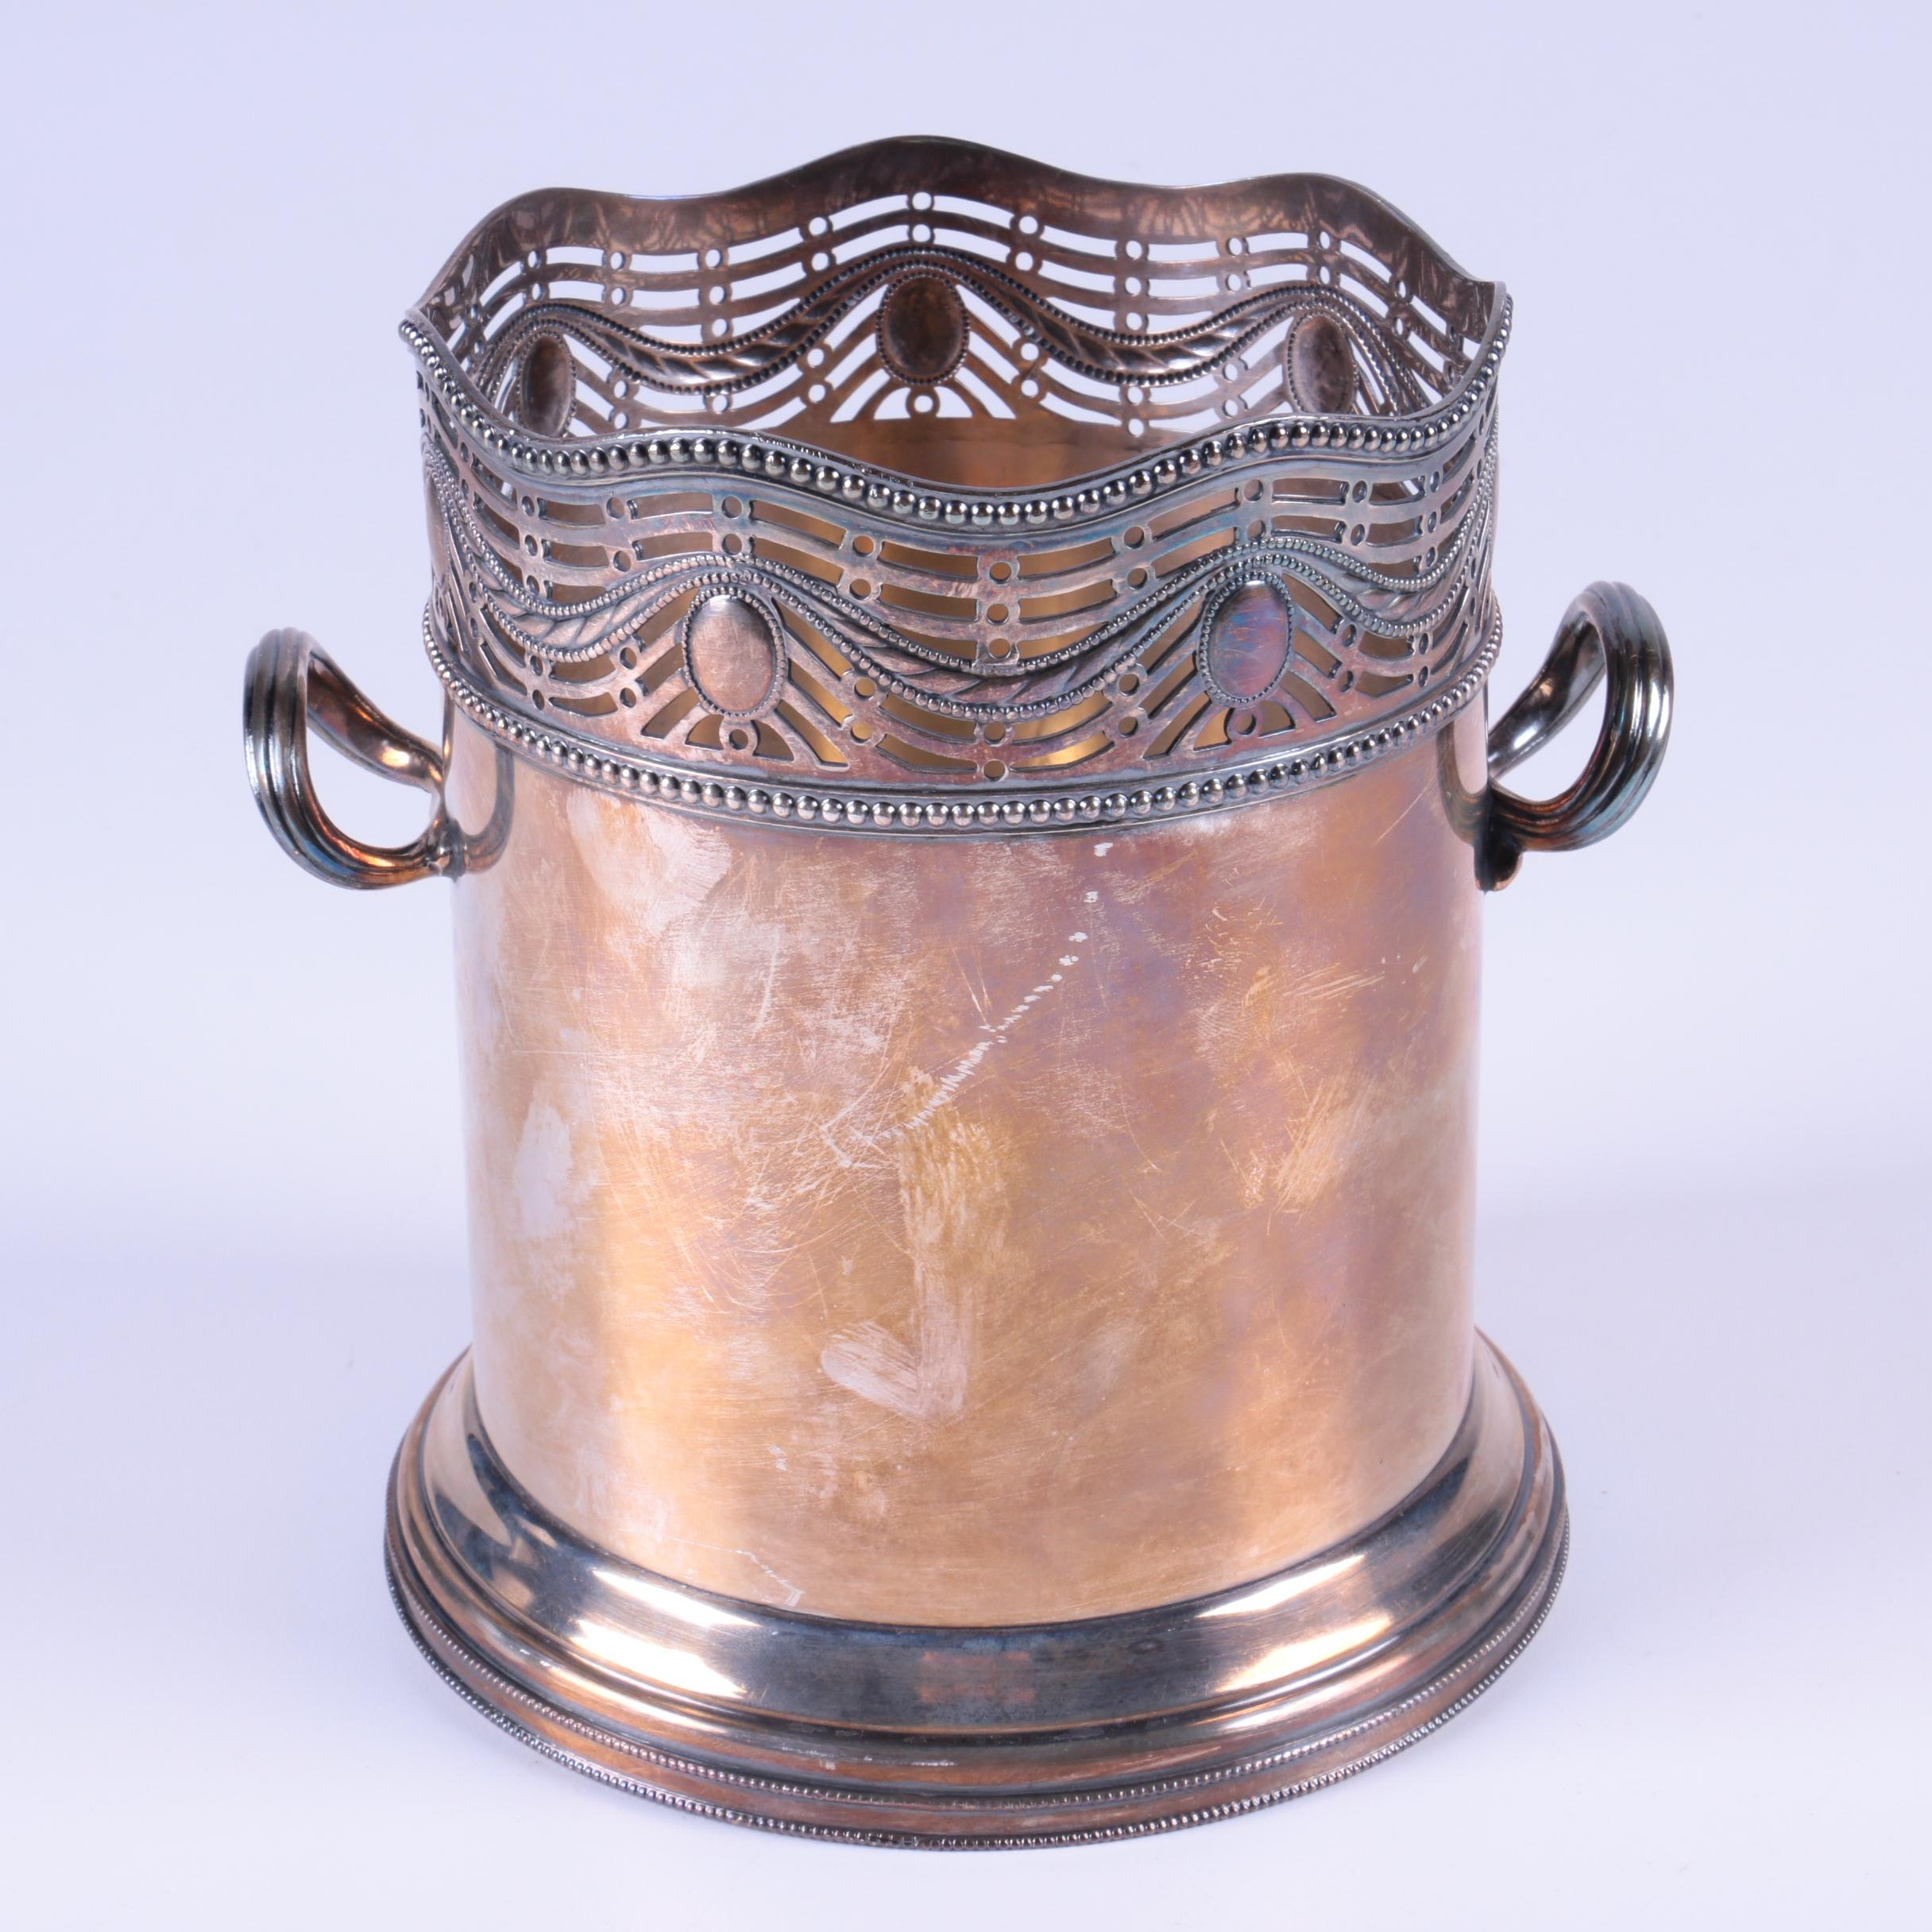 Ellis-Barker Silver Co. Silver-Plated Wine Bottle Stand